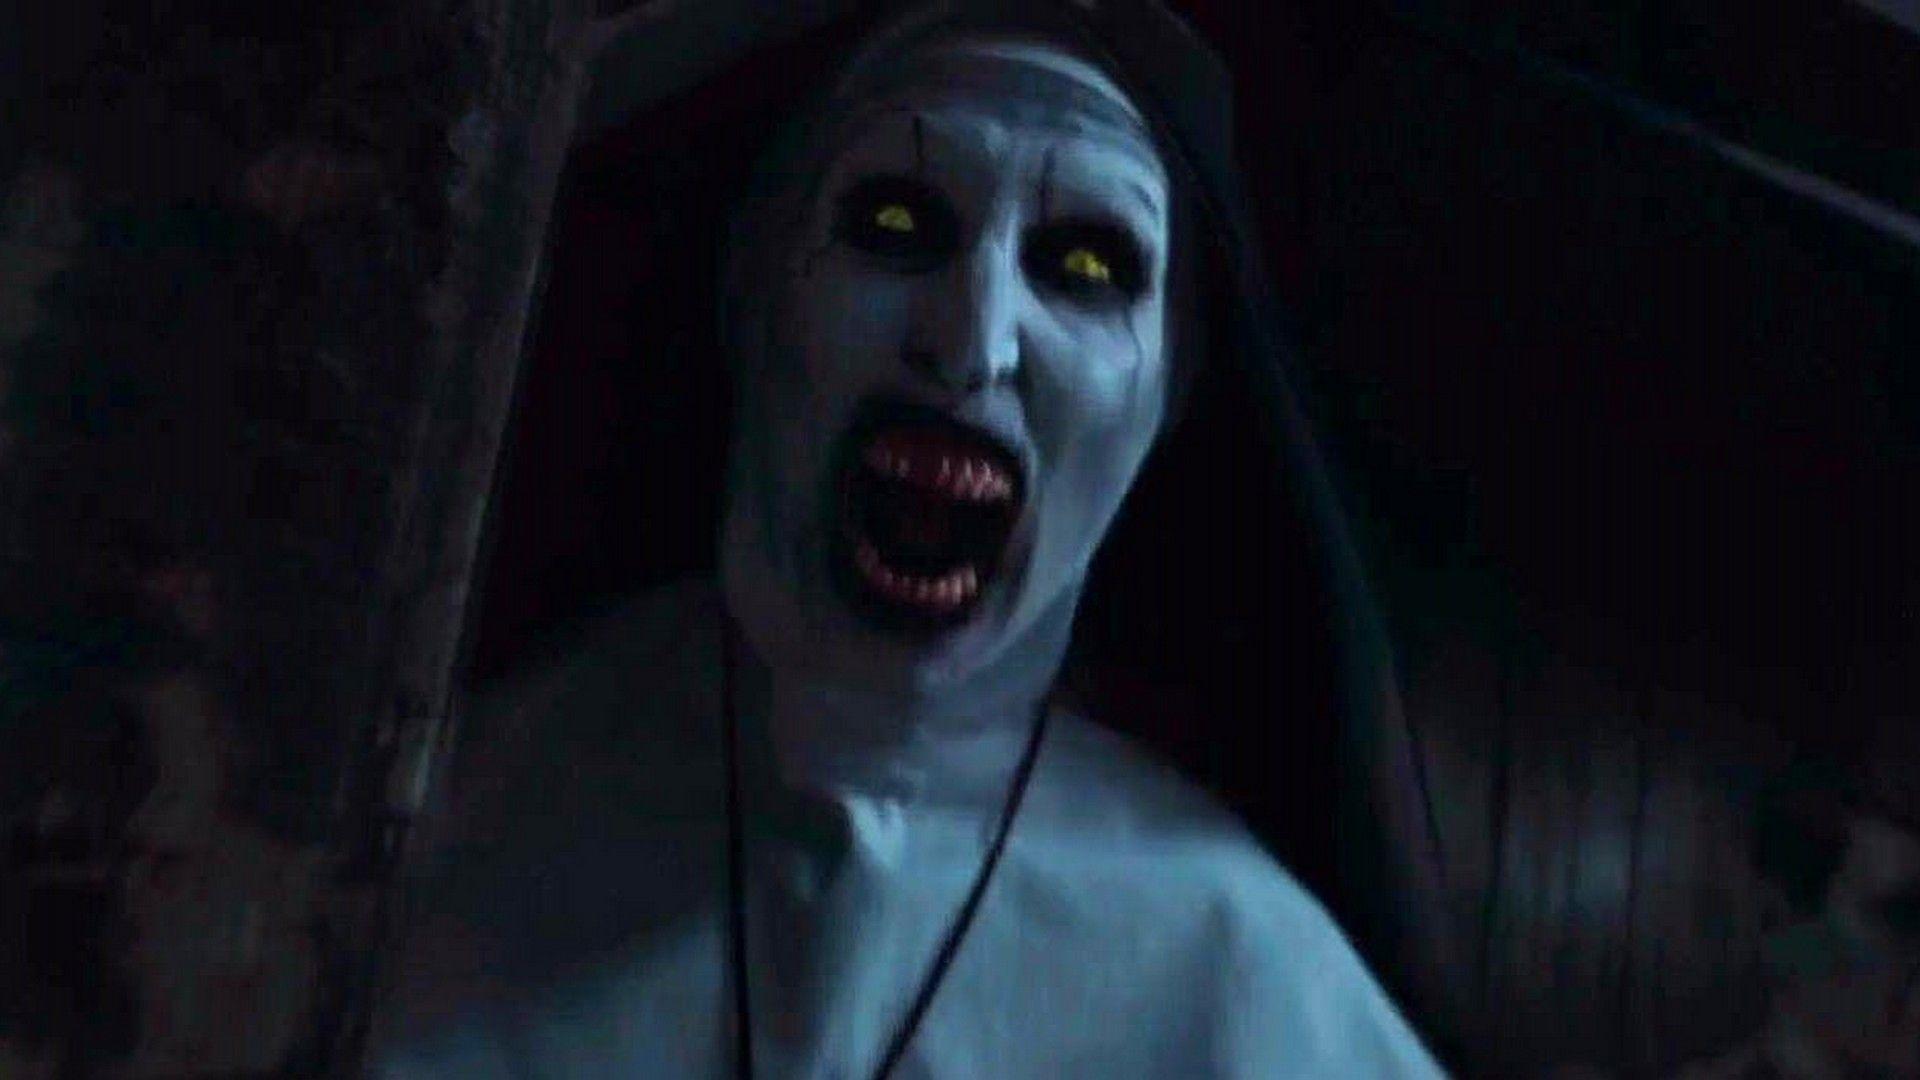 The Nun Wallpaper Hd The Conjuring Dark Books Horror